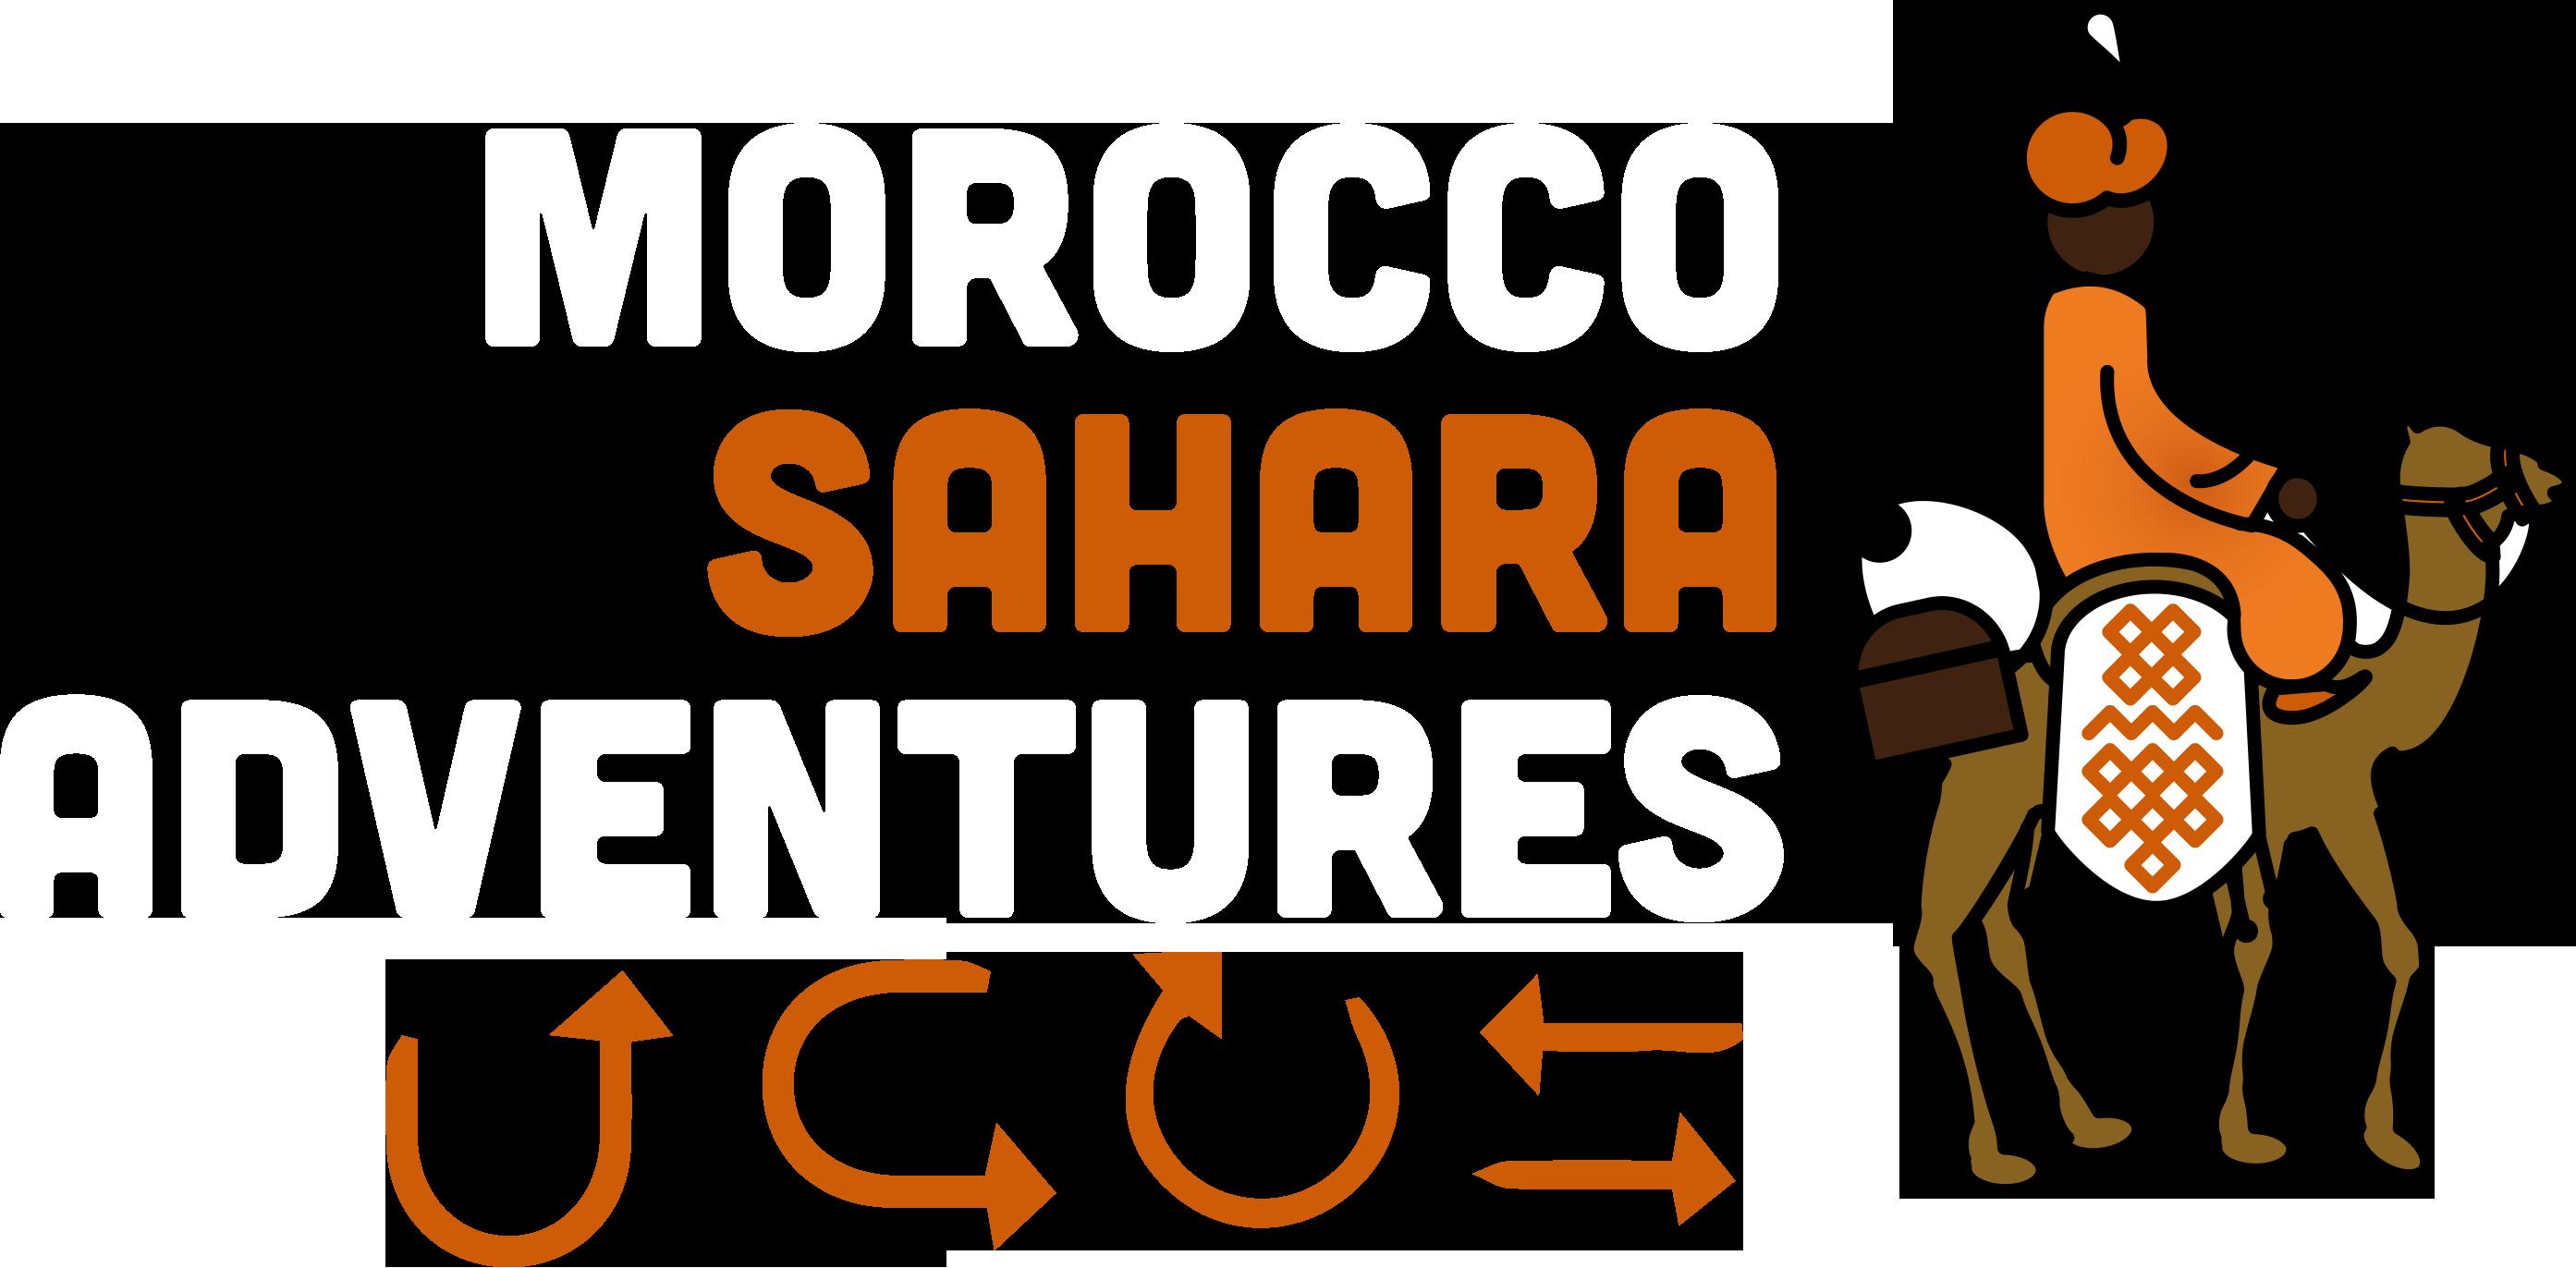 Camels clipart morocco Sahara Morocco Sahara Adventures Adventures